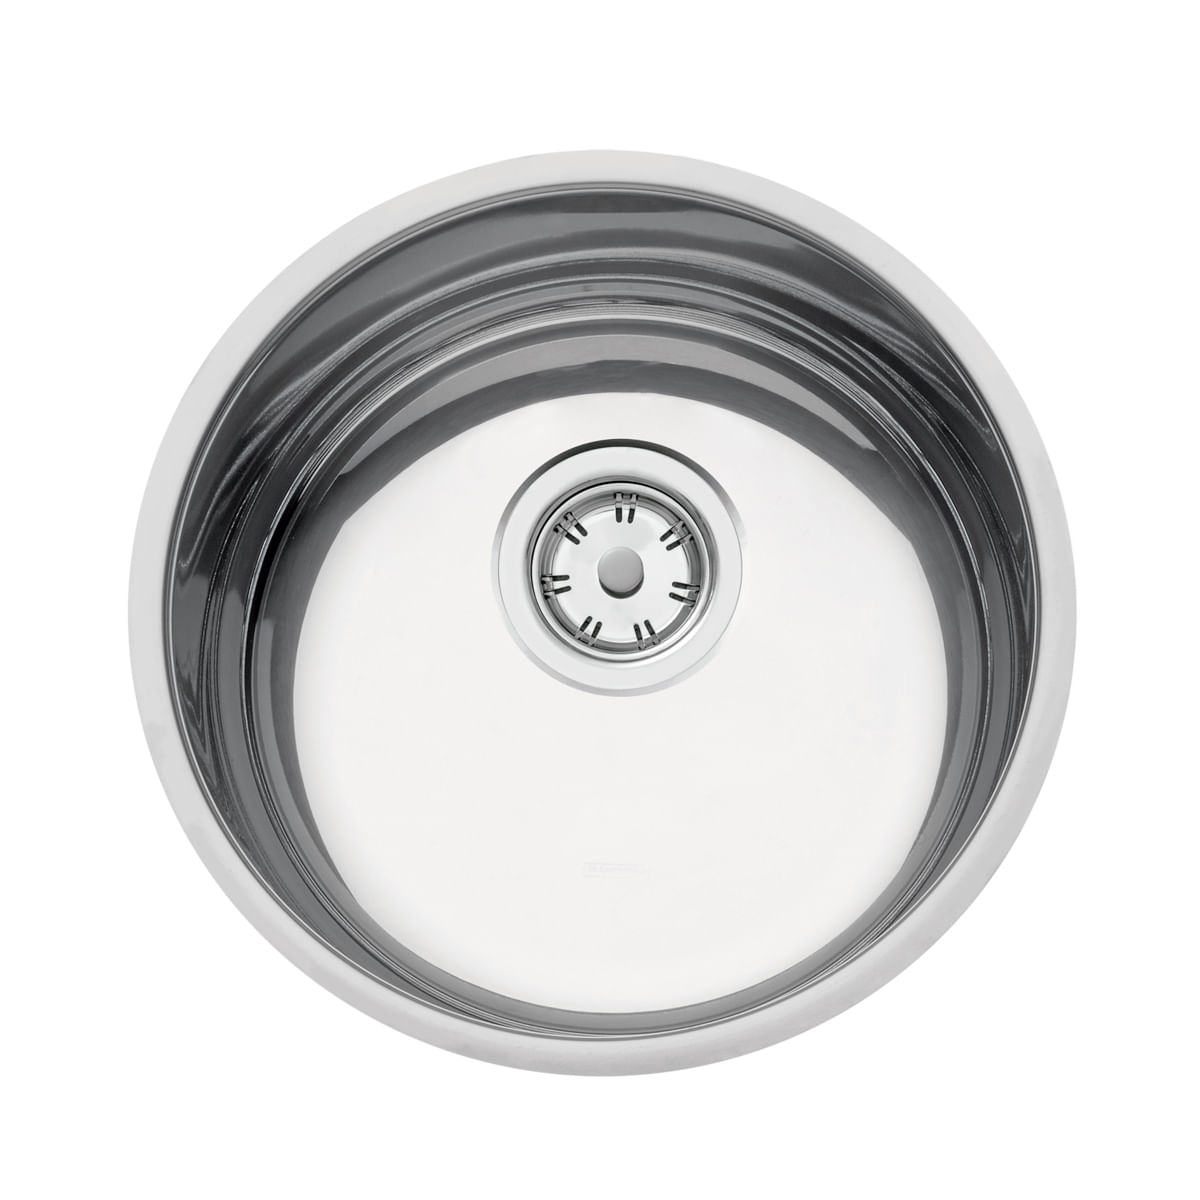 Cuba Tramontina Luna 30 BL Perfecta em Aço Inox Polido 30 cm